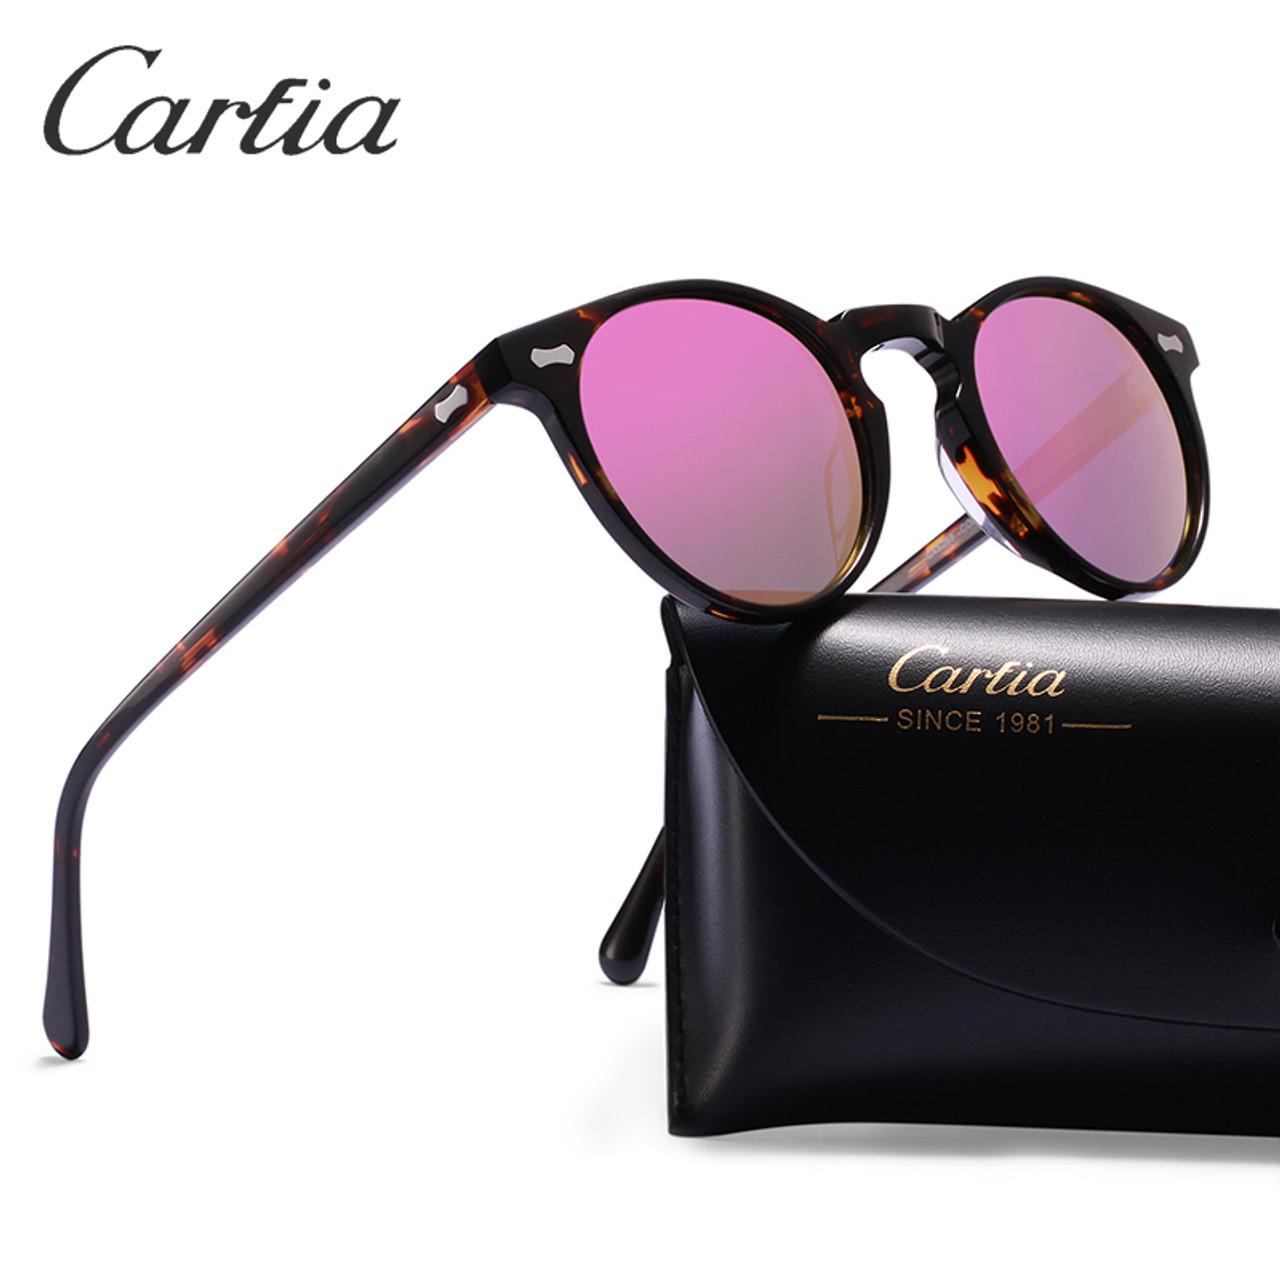 642b8da44b ... Carfia Polarized Sunglasses Classical Brand Designer Gregory Peck  Vintage Sunglasses Men Women Round Sun Glasses 100 ...